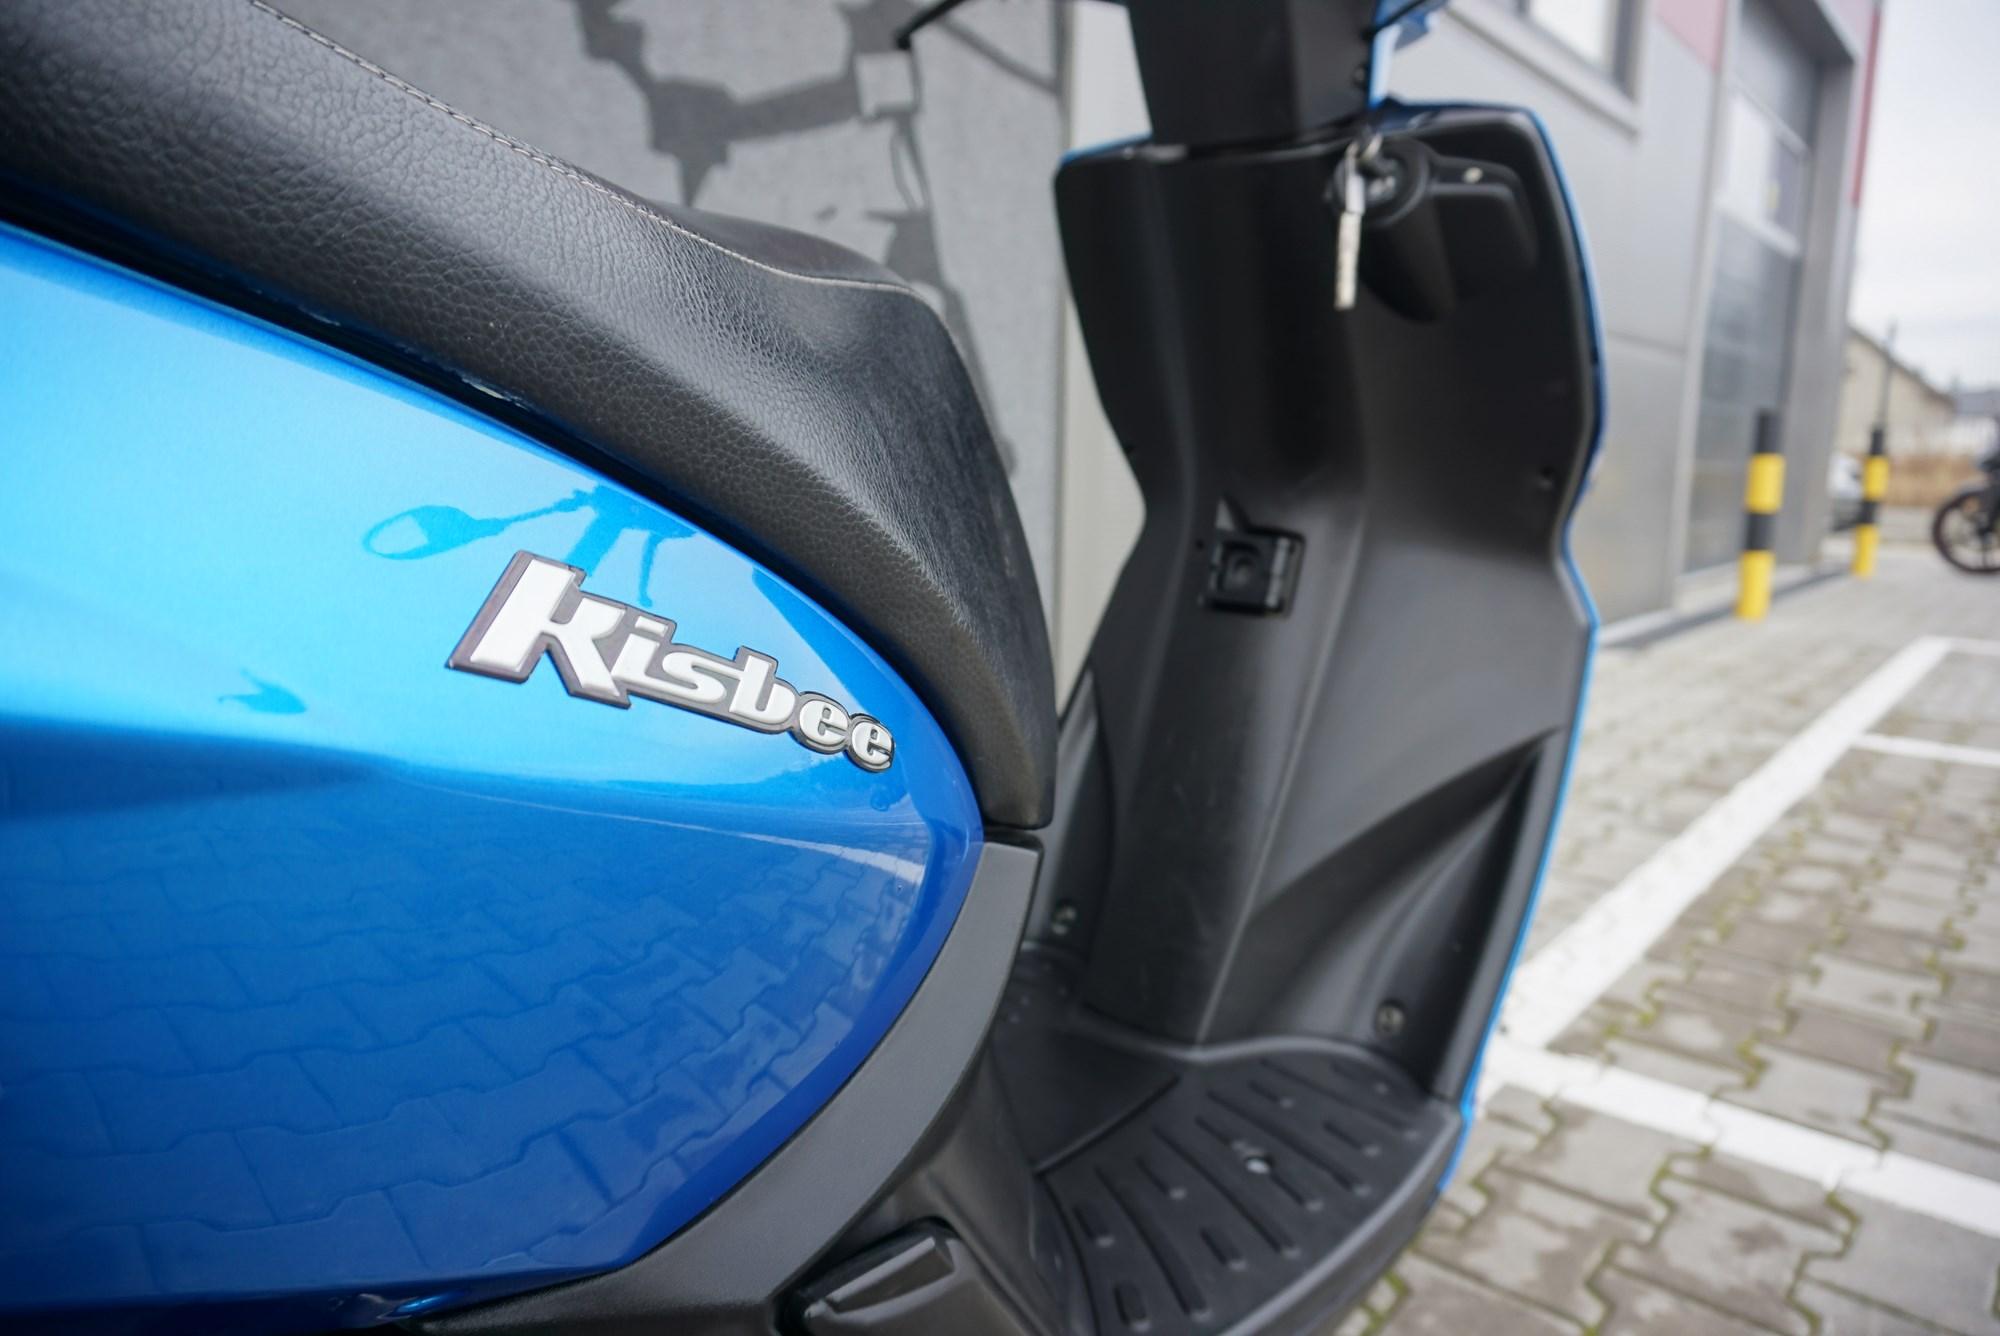 Peugeot Kisbee 50 2T